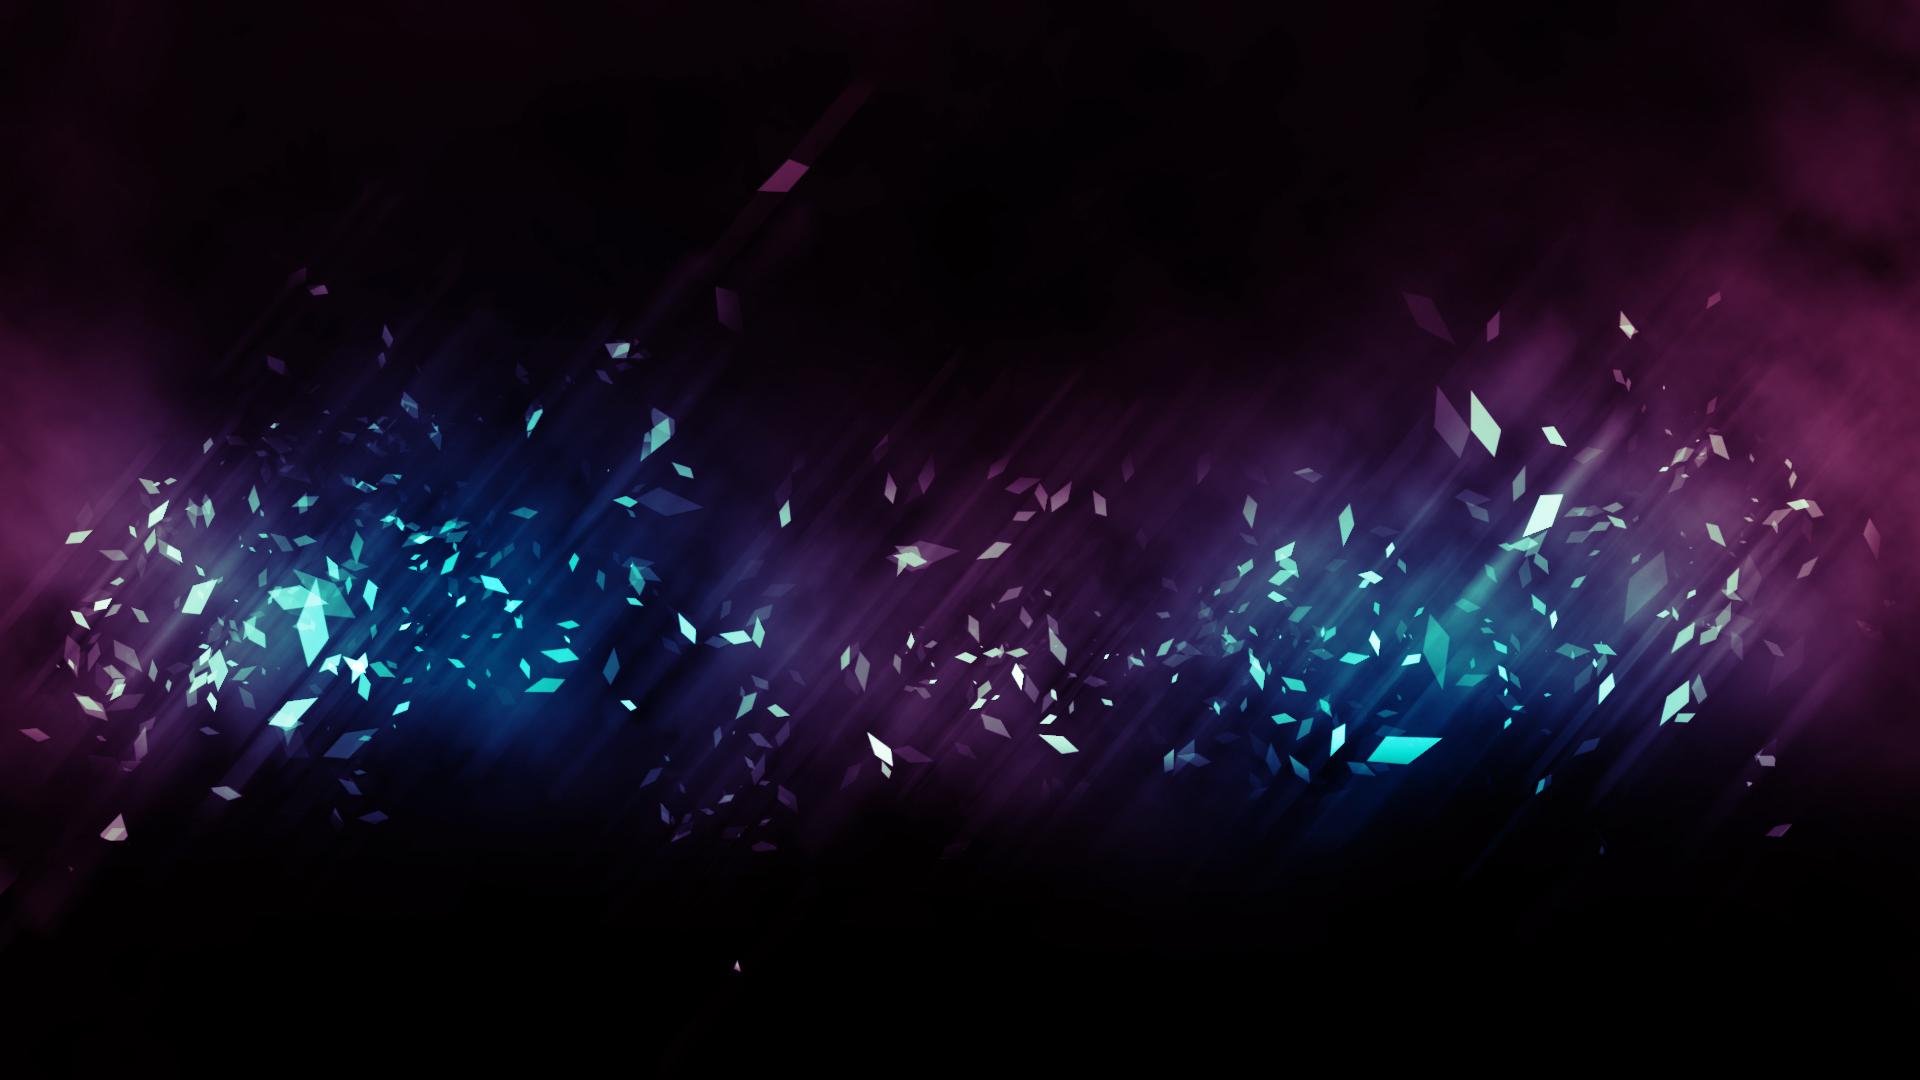 Desktop Wallpaper Backgrounds 1080p 1920x1080